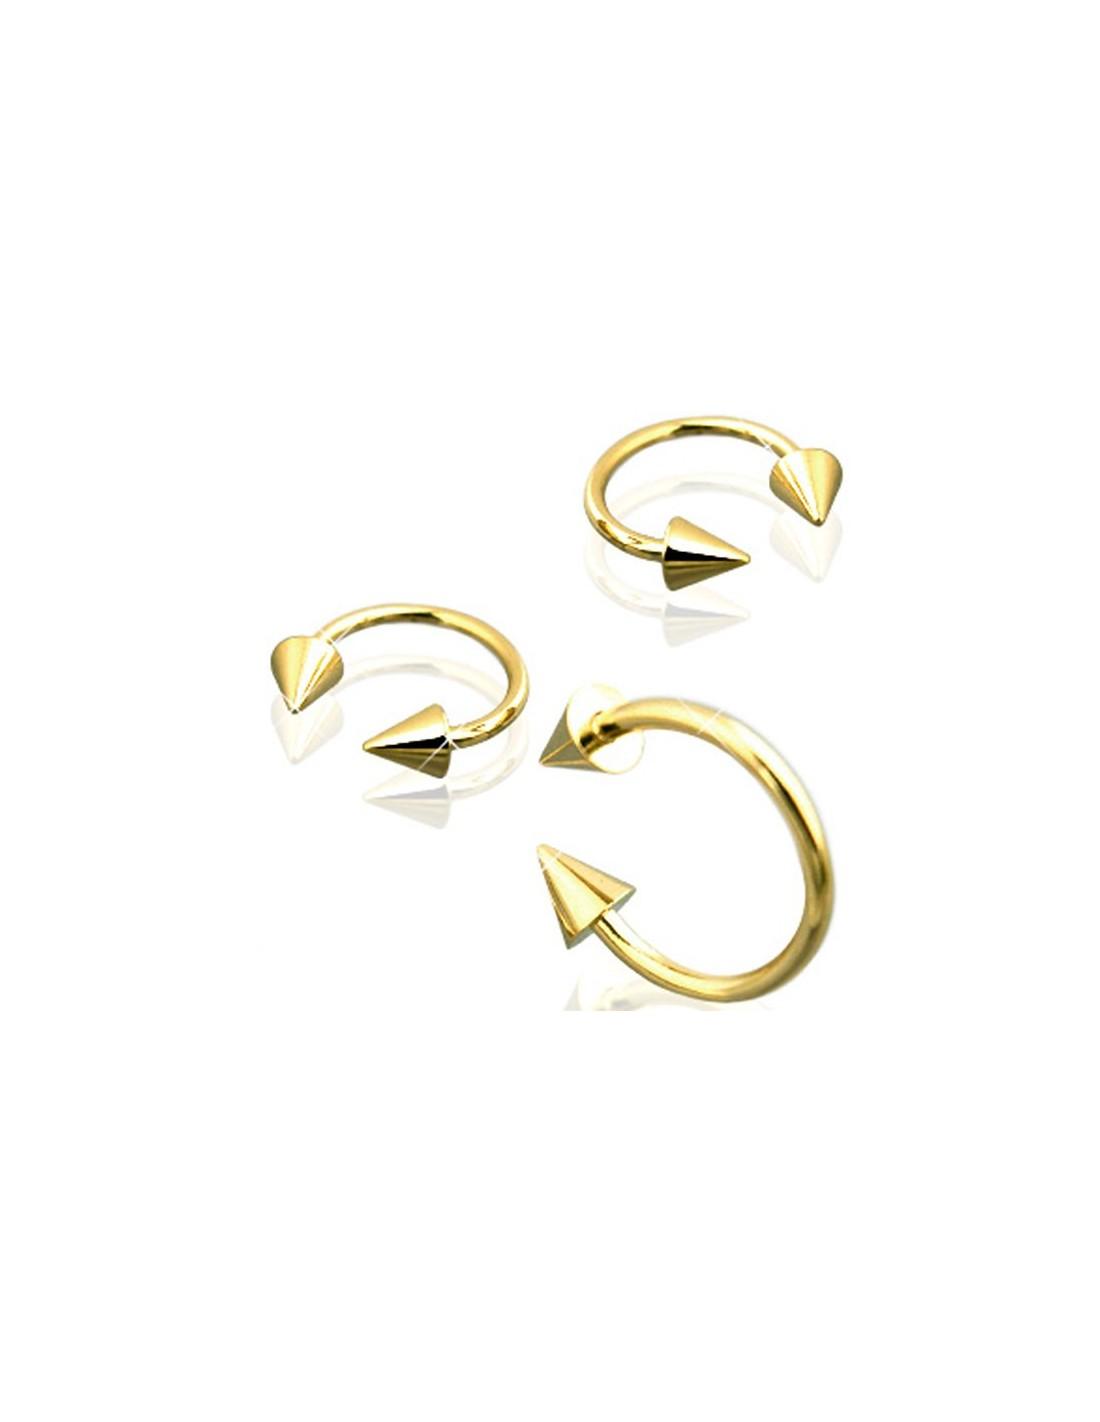 piercing circulaire or bijou arcade avec cones dore or fin. Black Bedroom Furniture Sets. Home Design Ideas